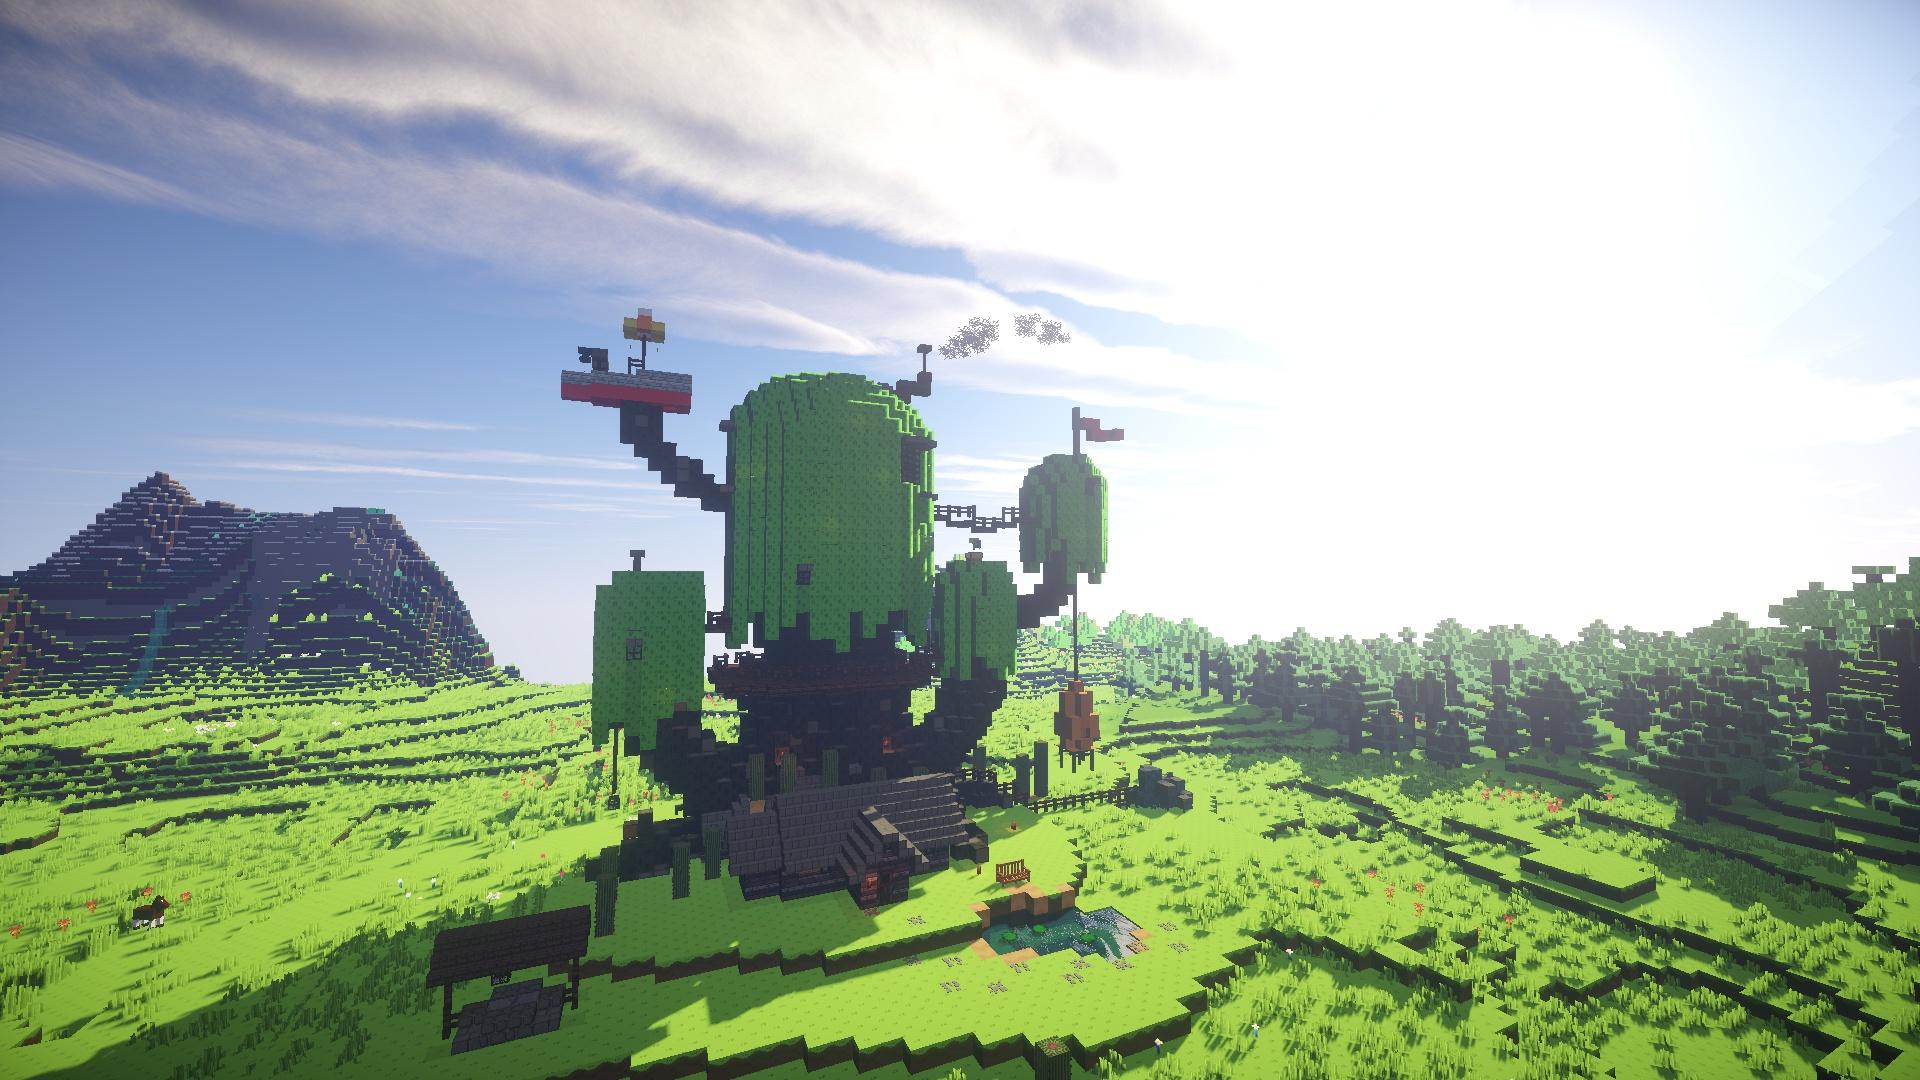 Minecraft free wallpaper